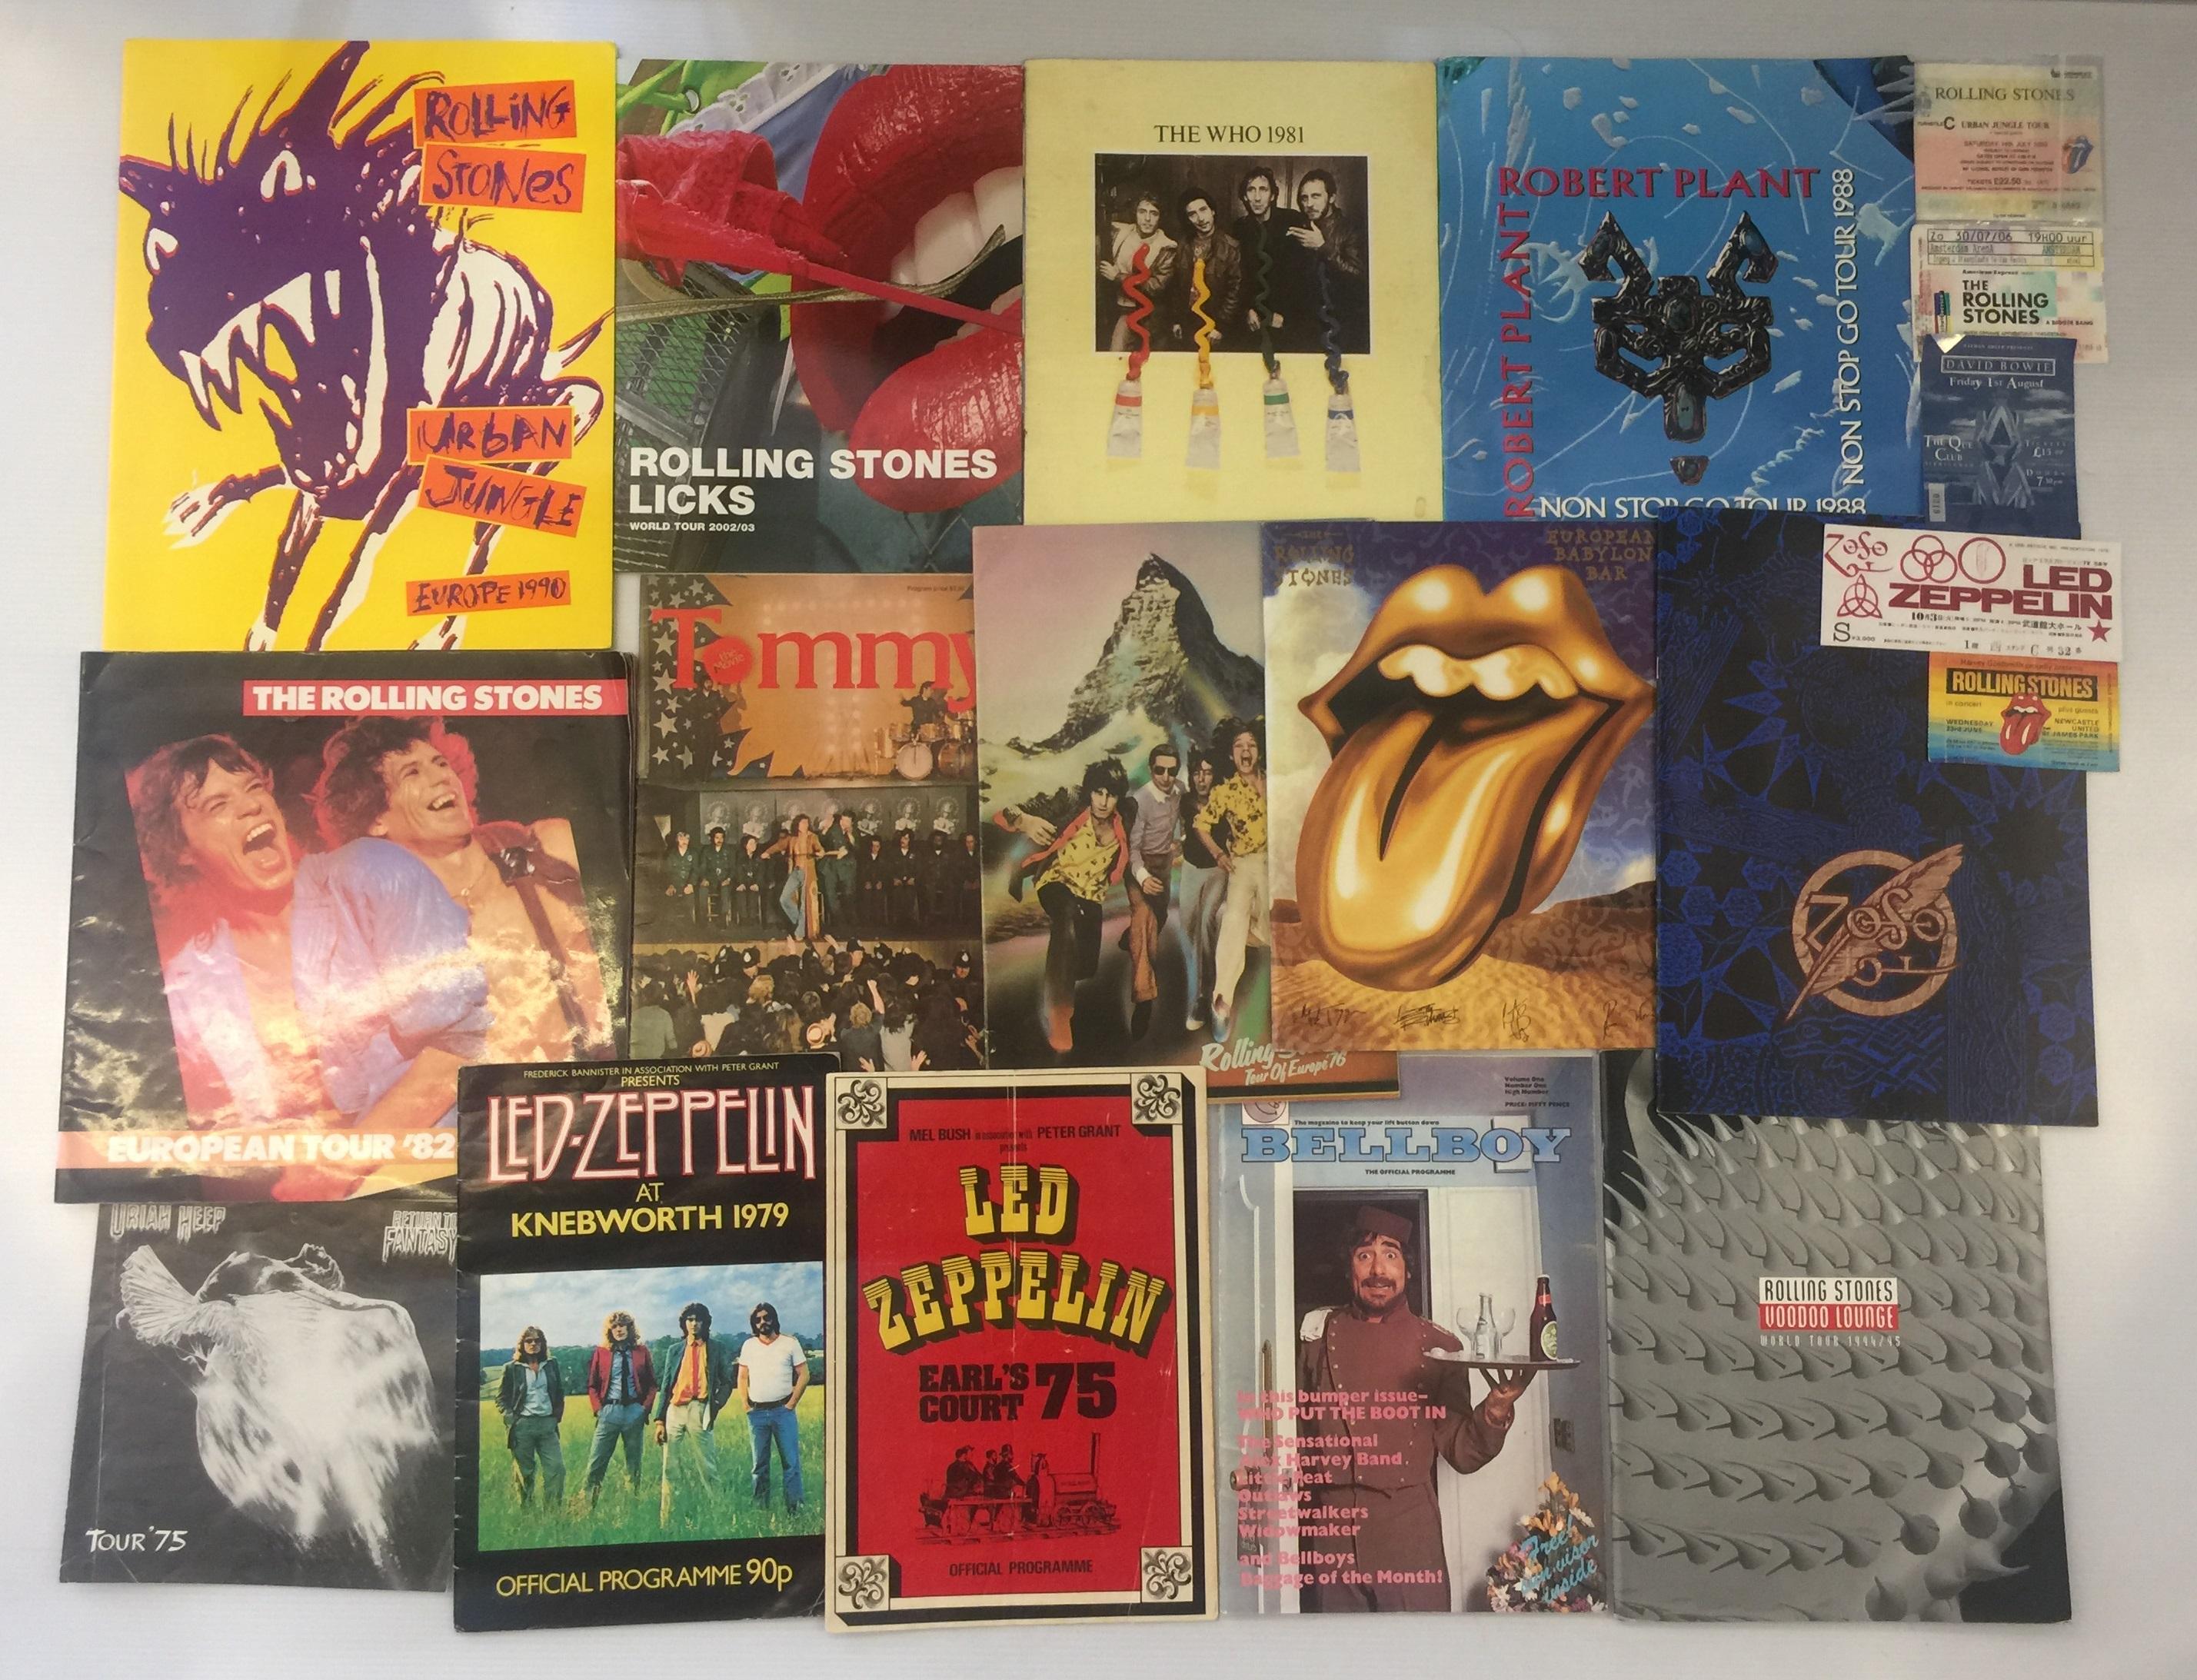 Led Zeppelin Rolling Stones Rock Programmes Amp Tickets